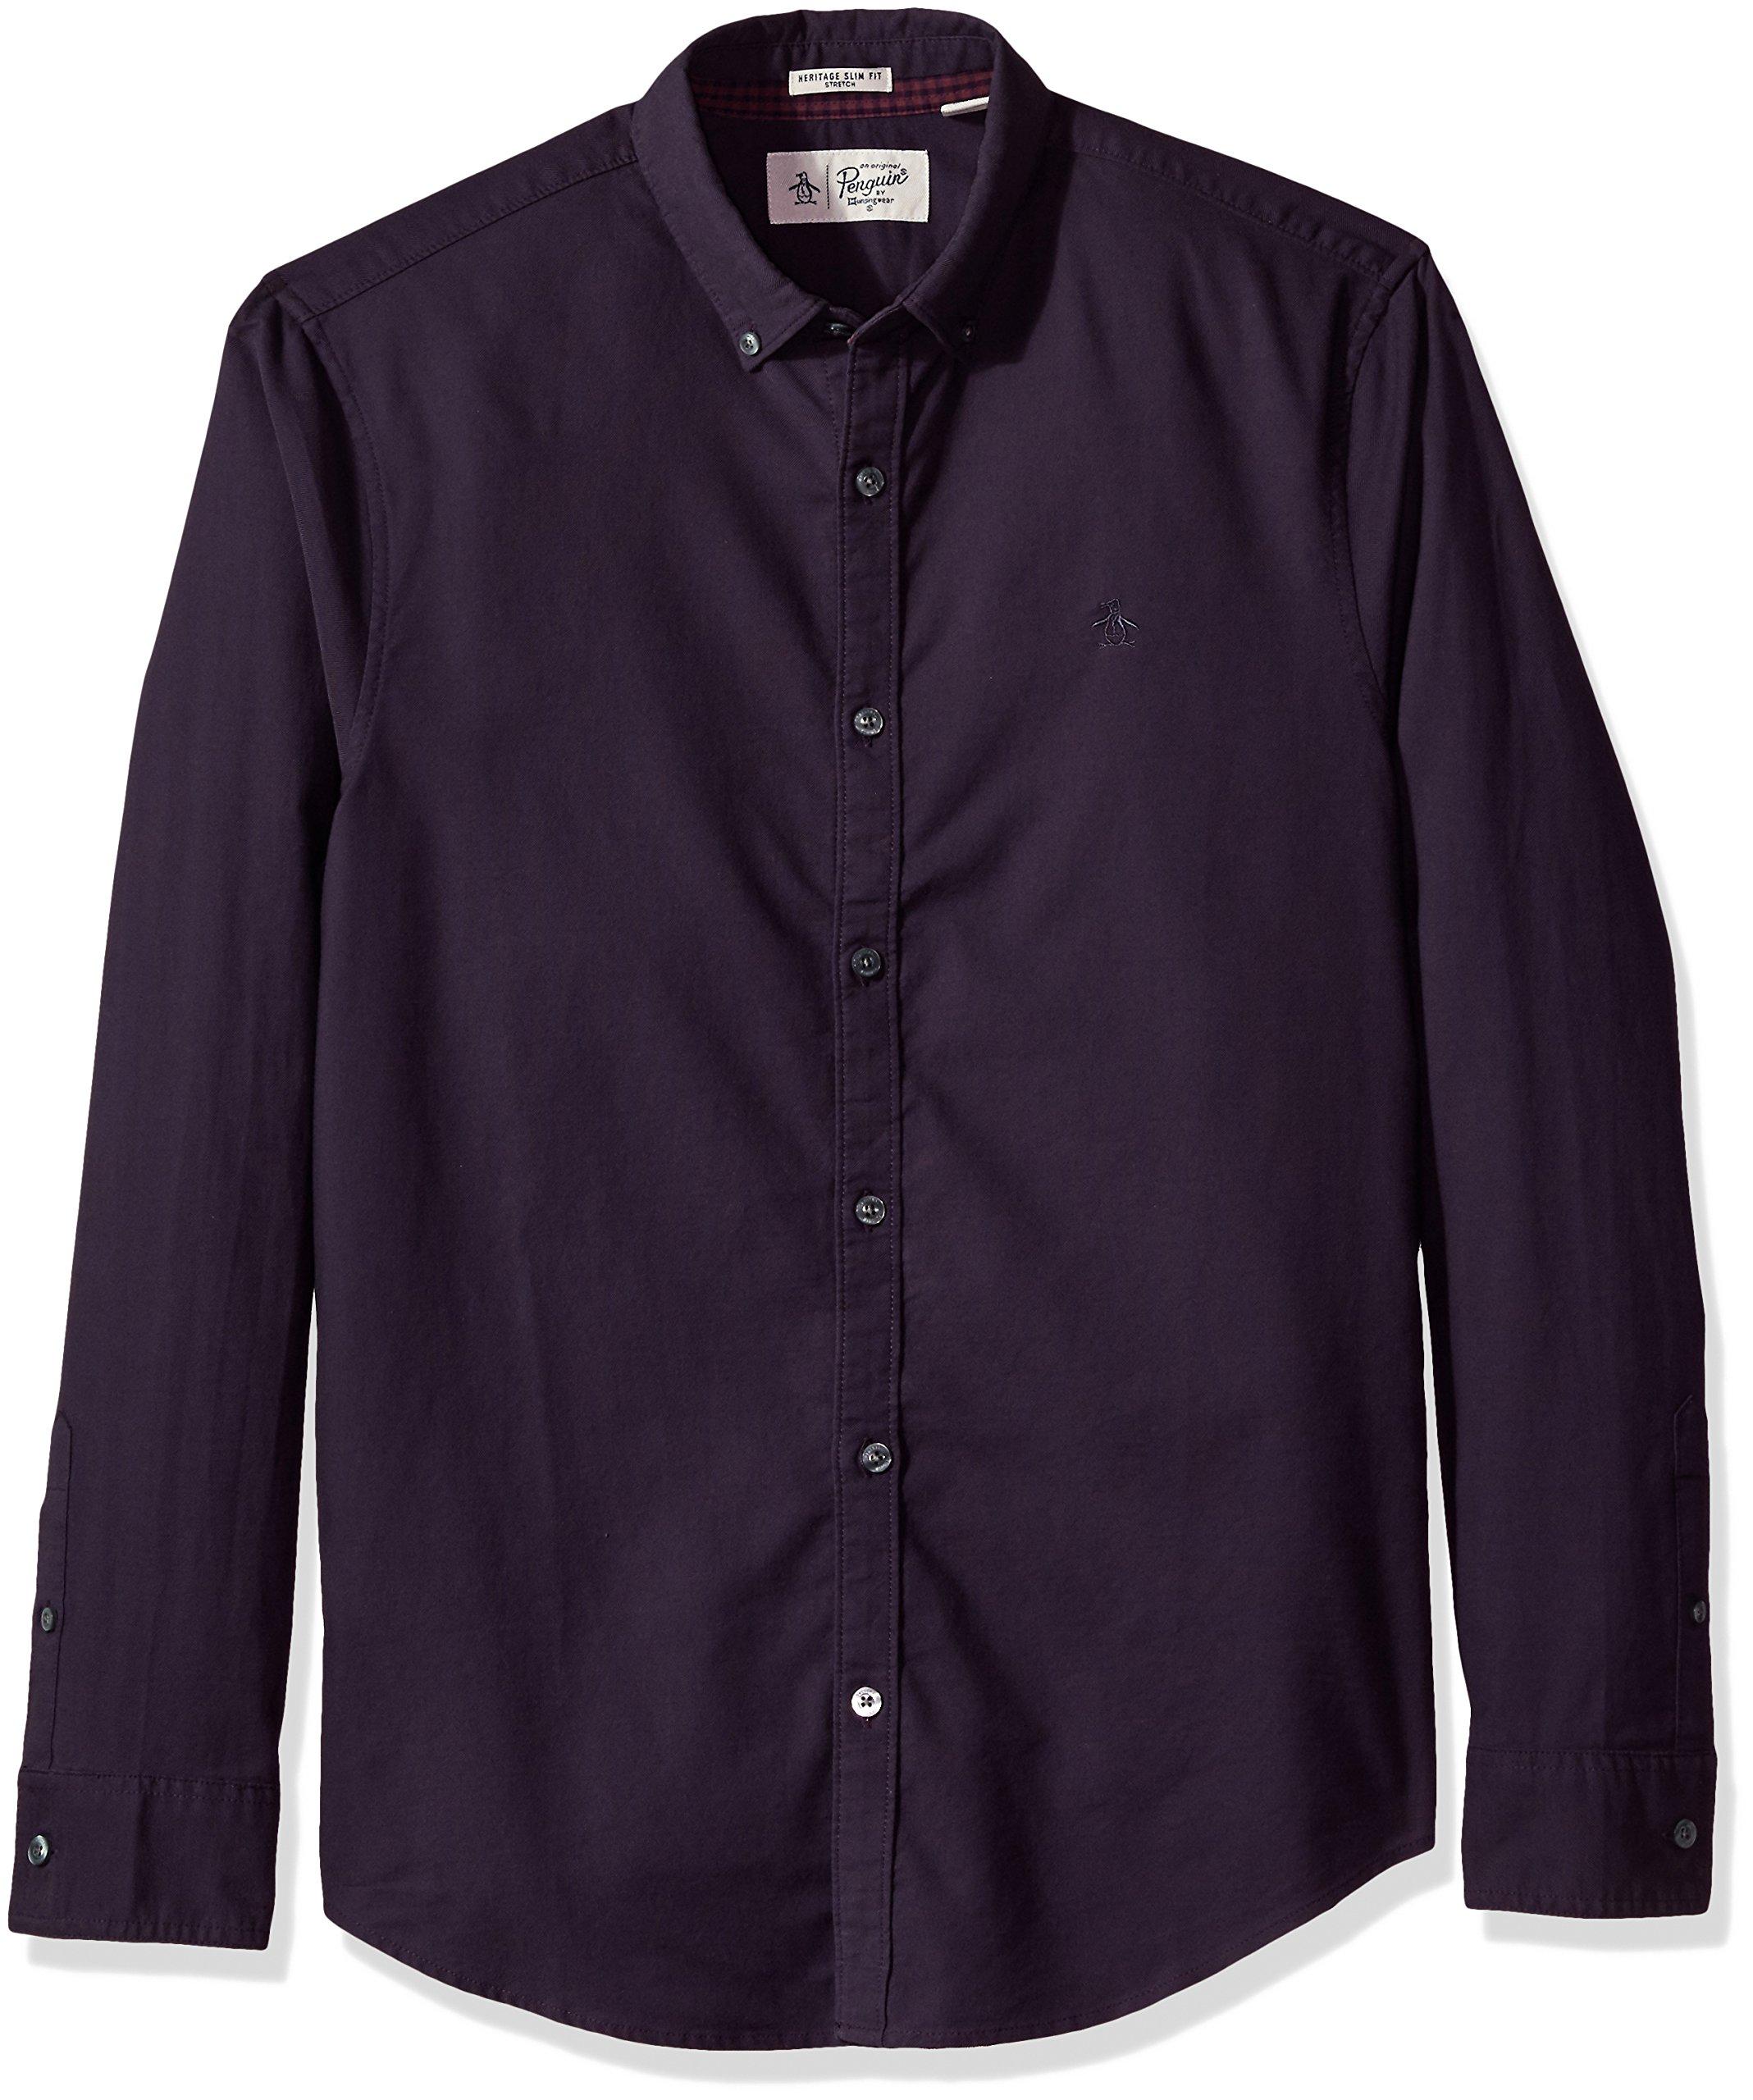 Original Penguin Men's Thinly Striped Oxford Dress Shirt, Nightshade, Large